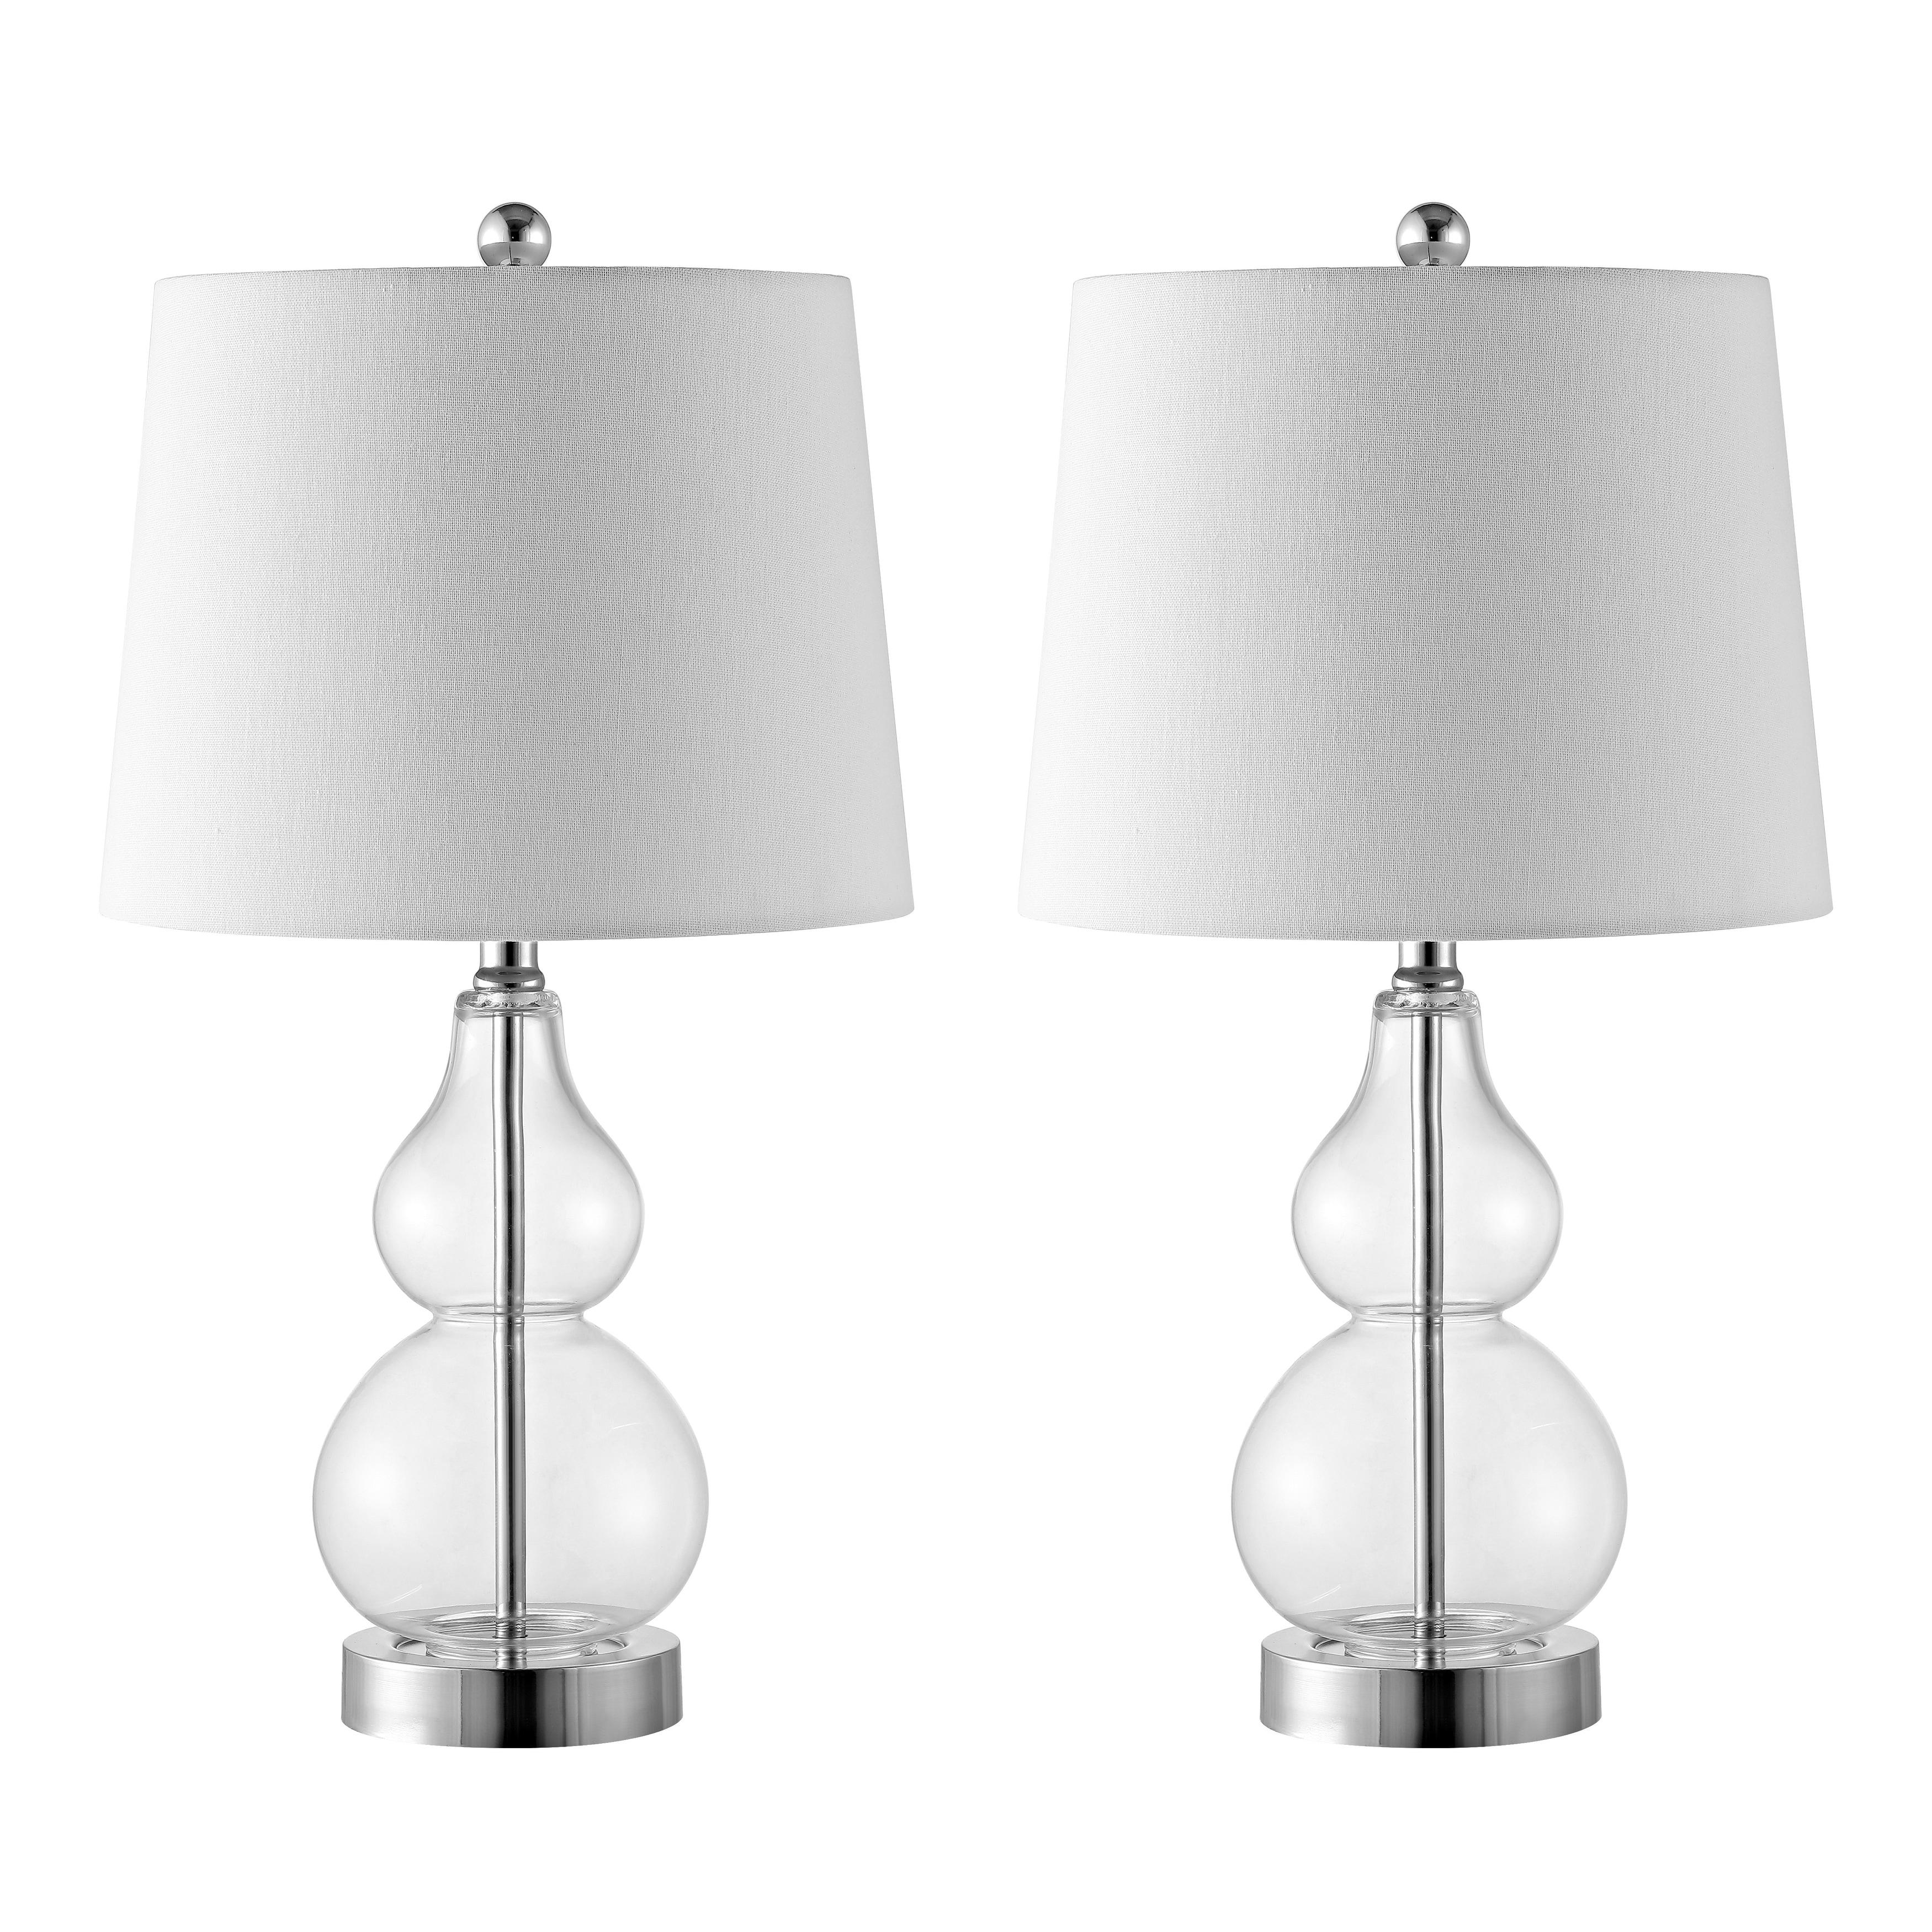 Safavieh Lighting 22 Brisor Table Lamp Set Of 2 12 W X 12 L X 22 H On Sale Overstock 29779259